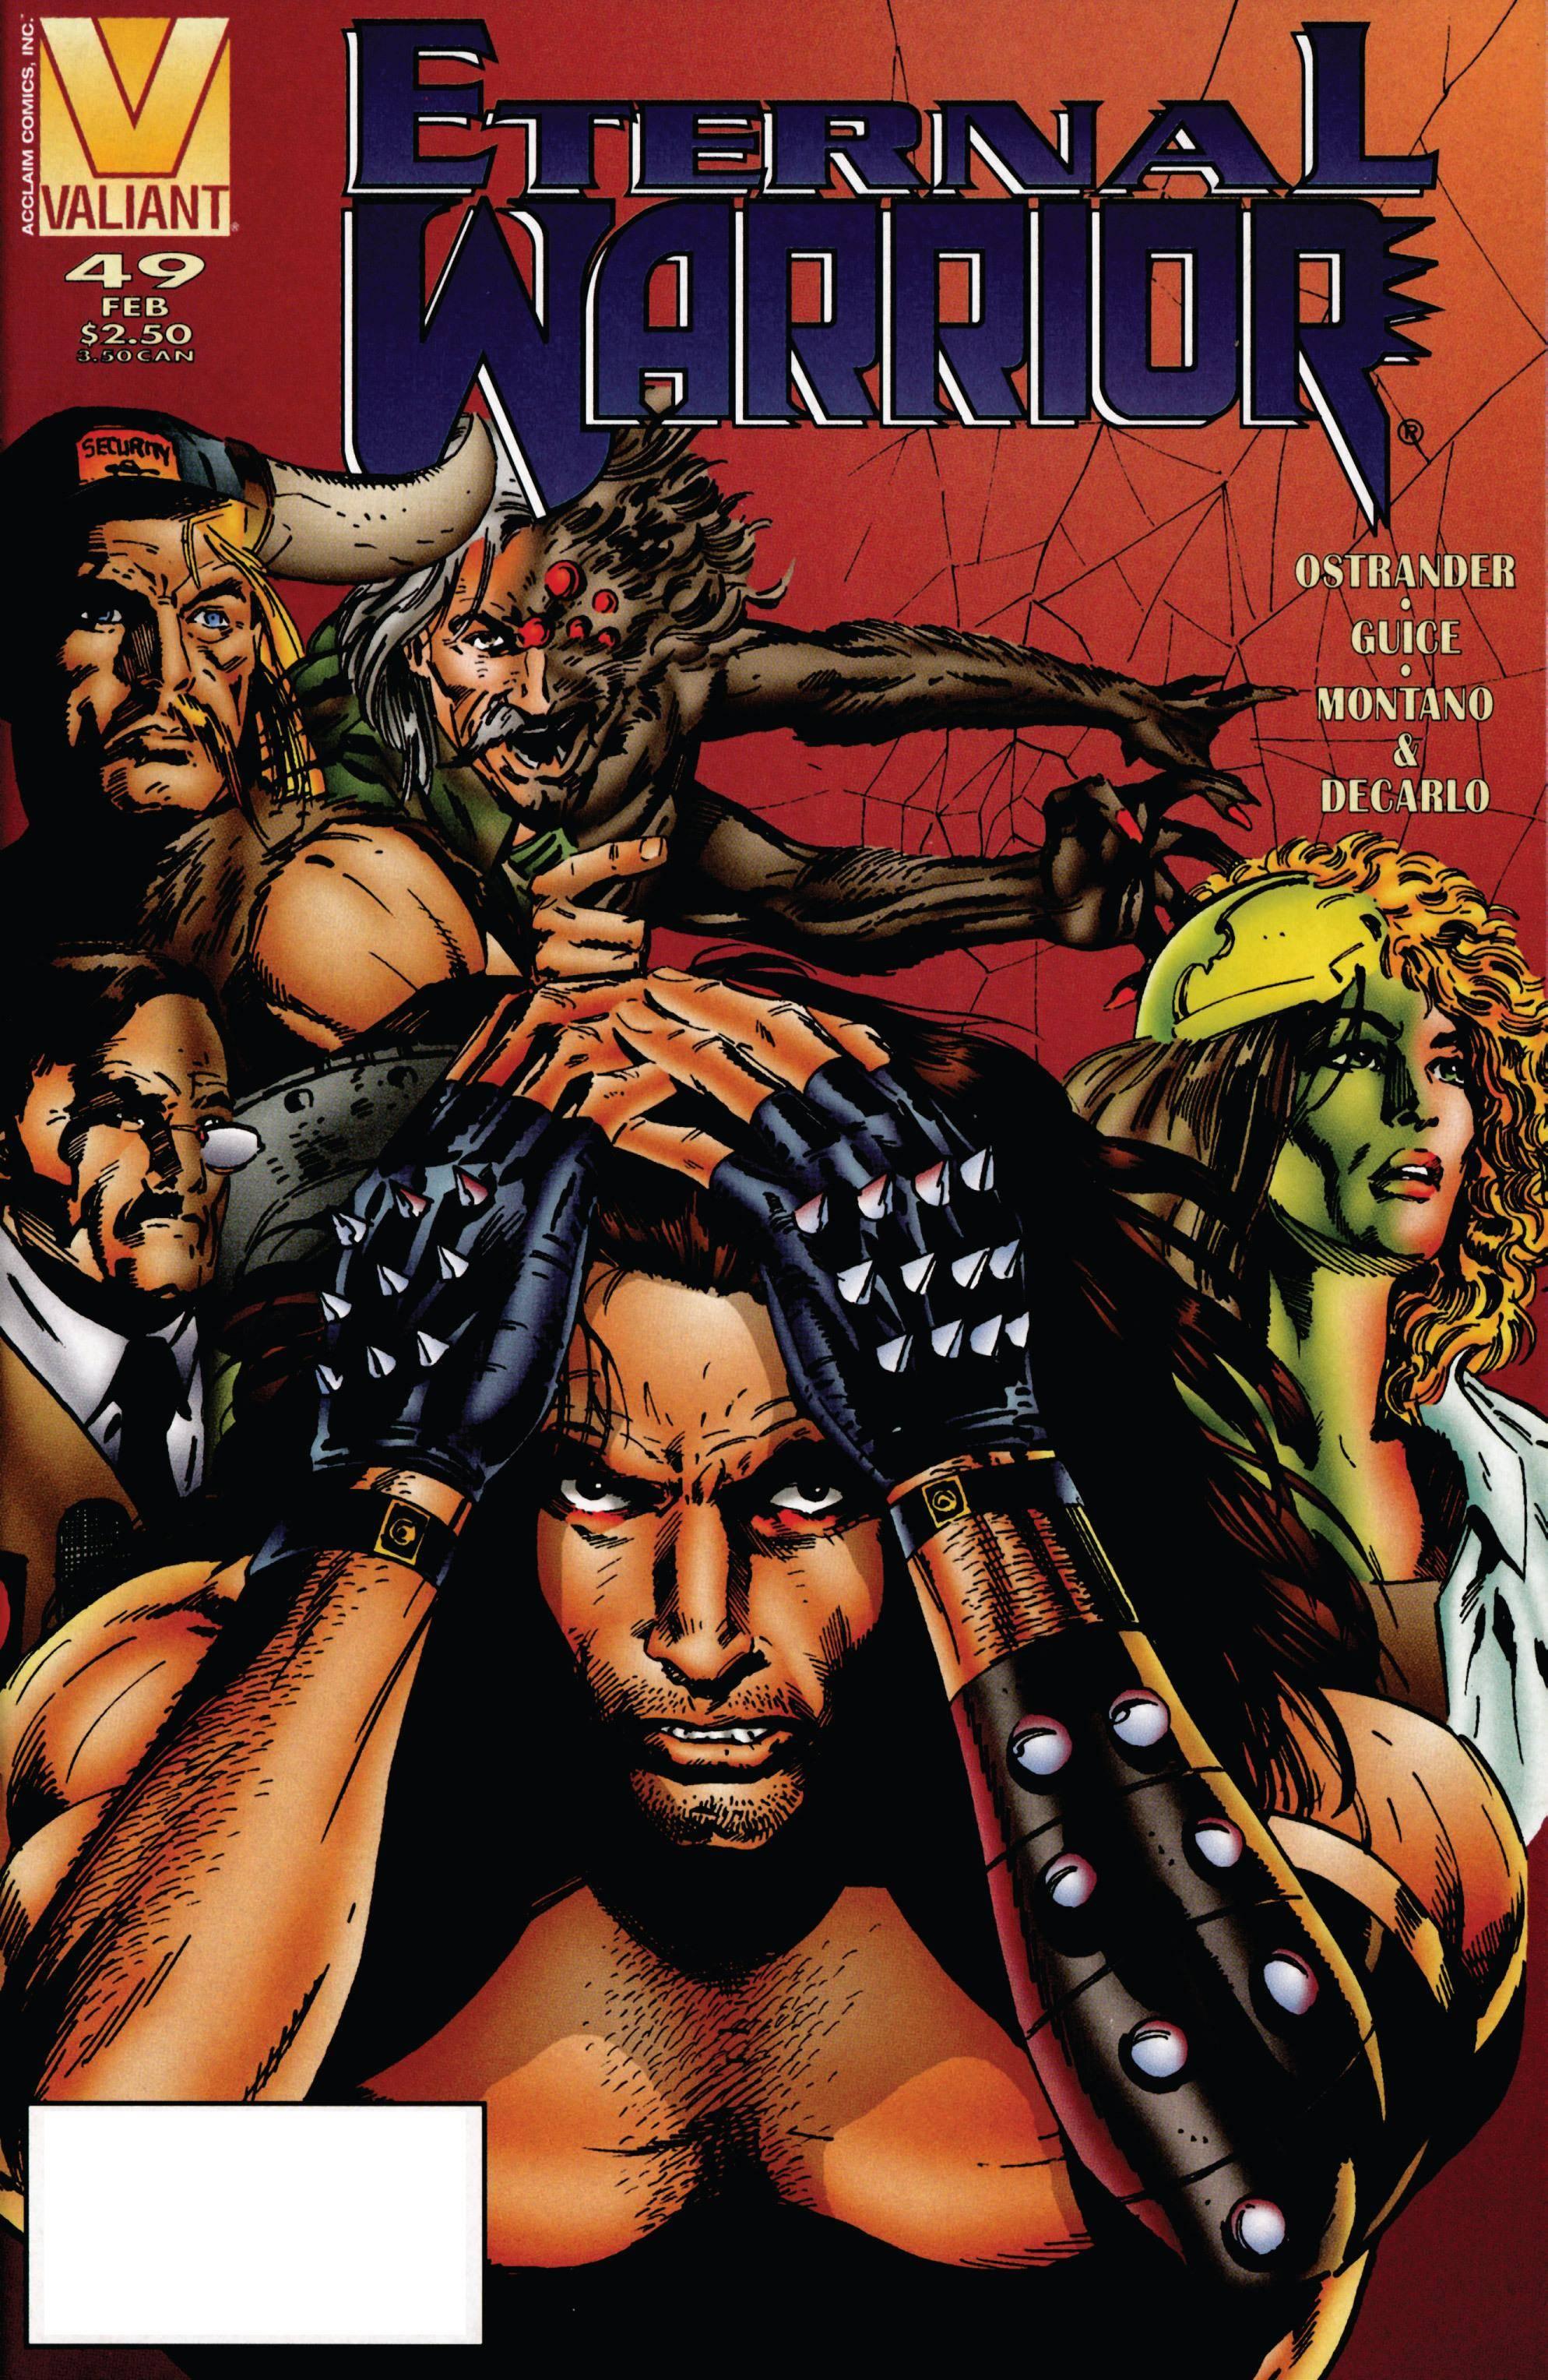 Eternal Warrior 49 1996 digital